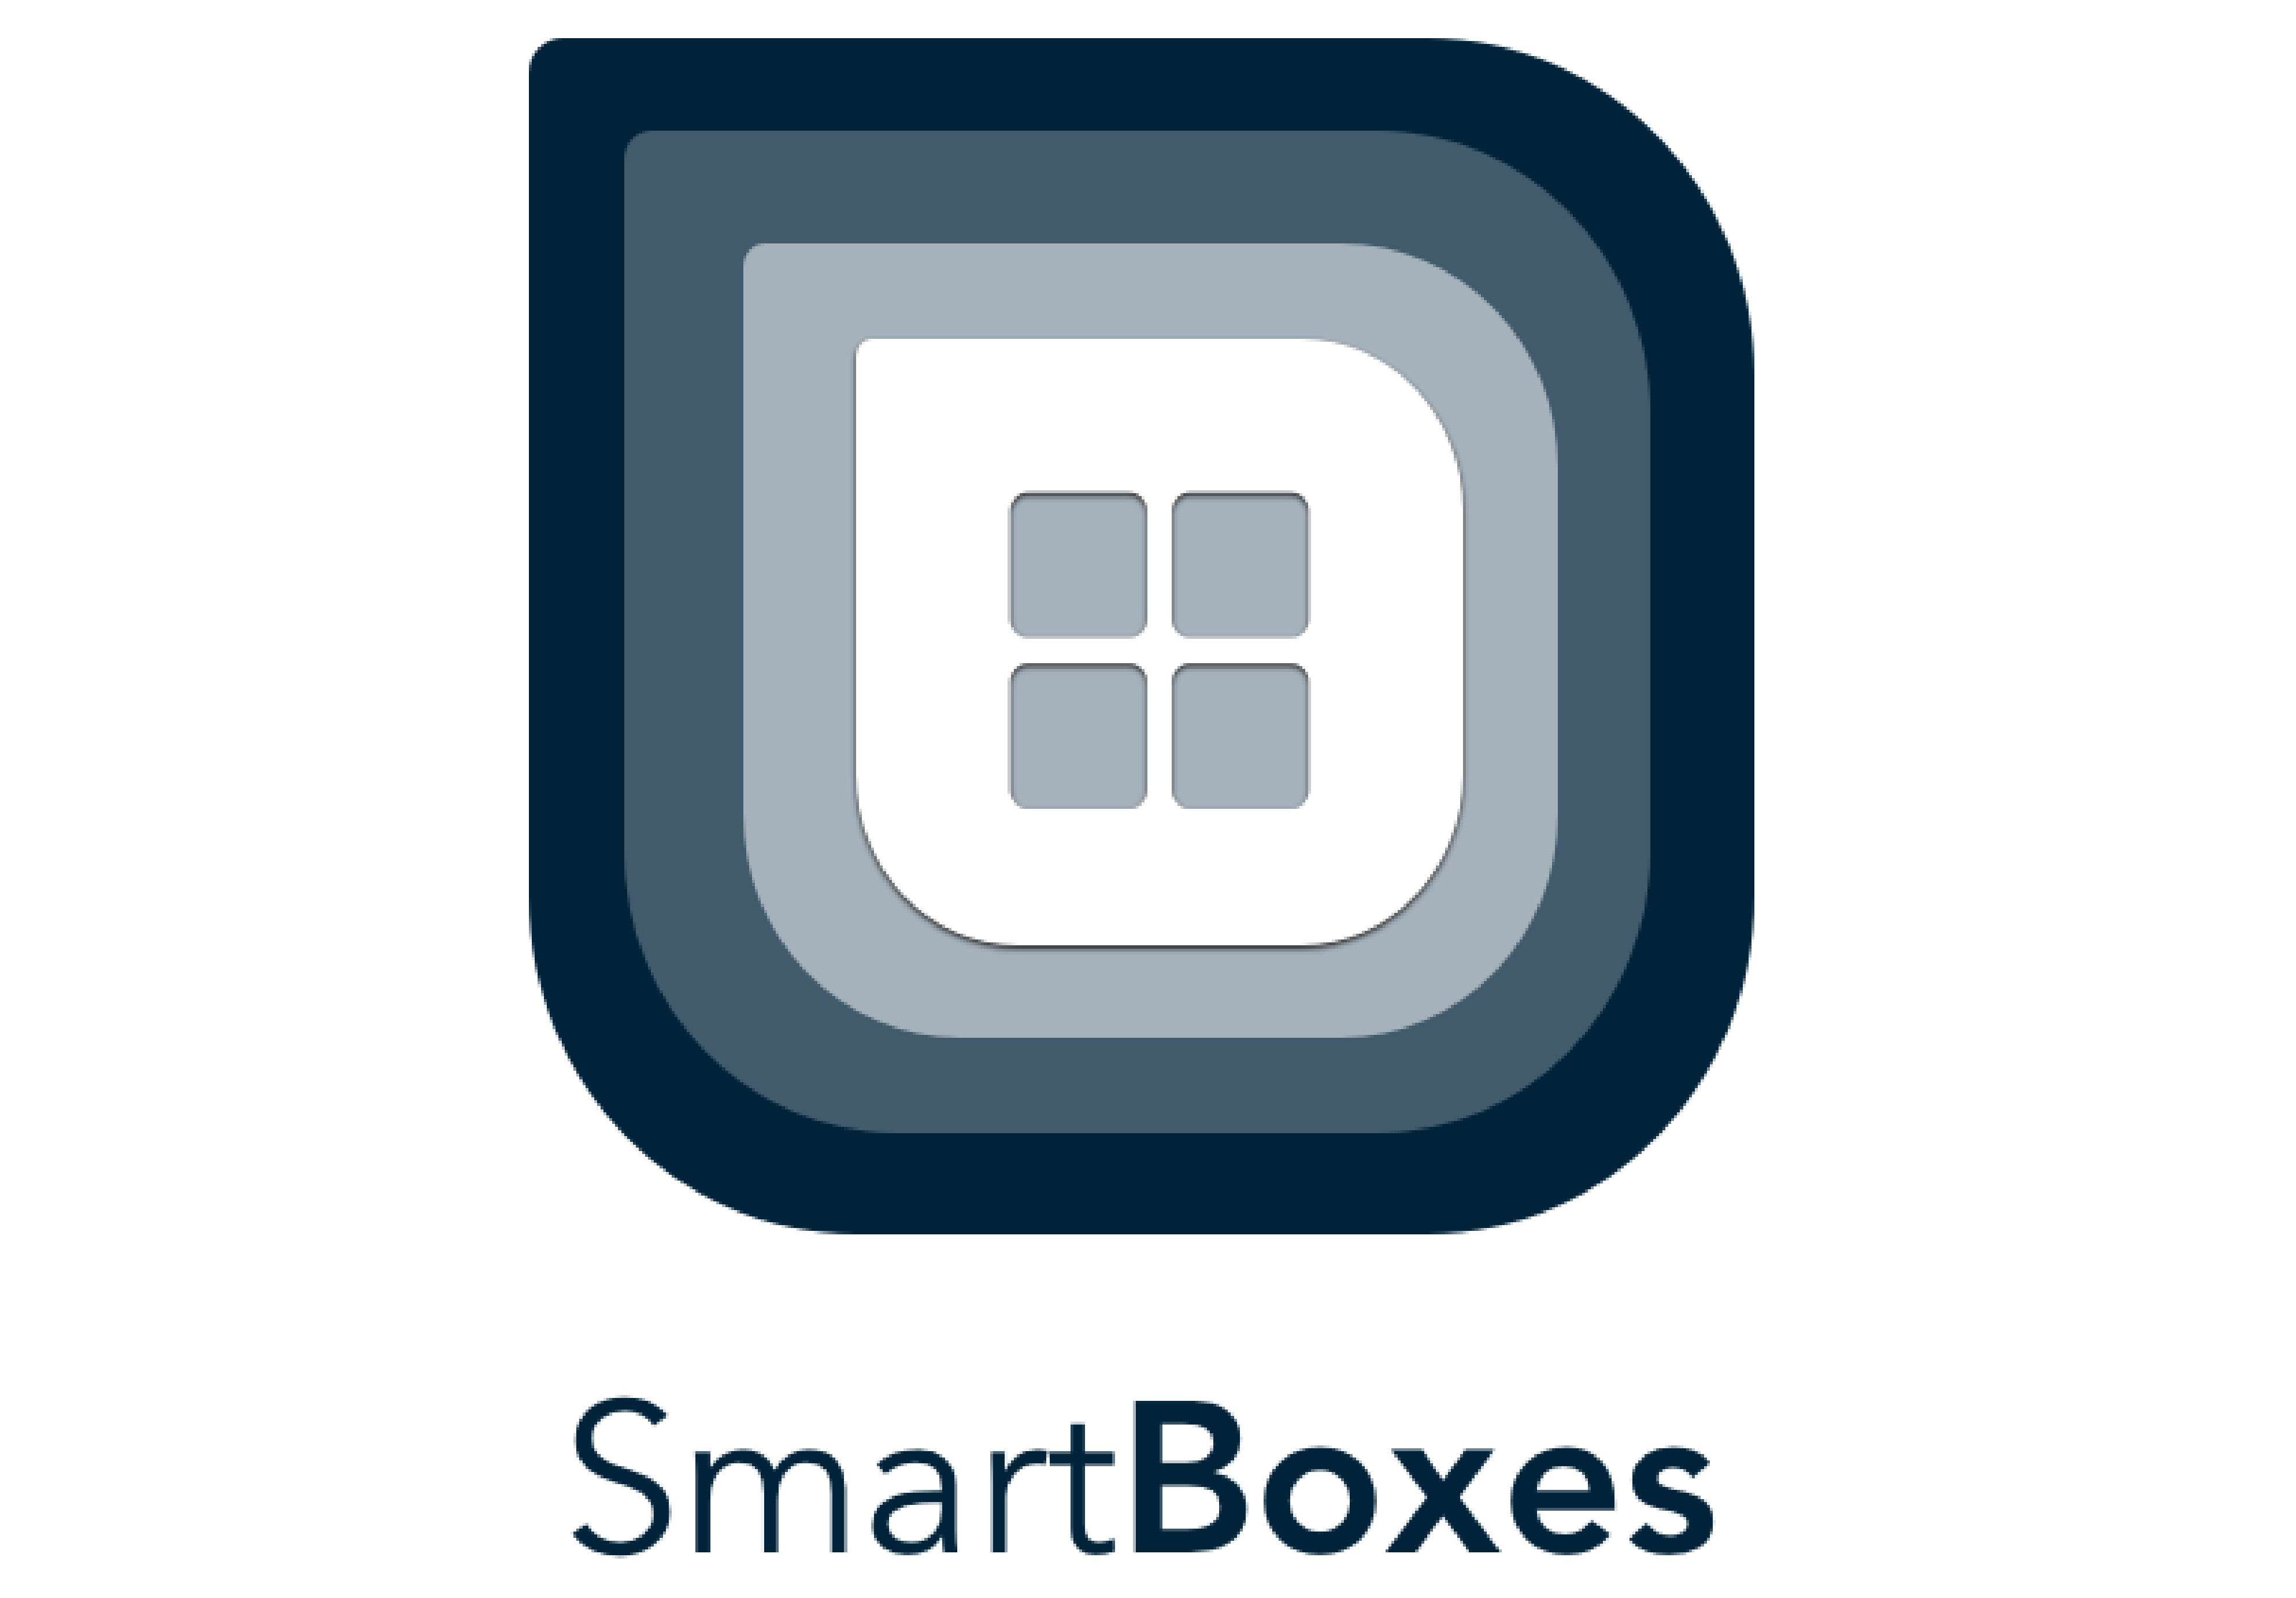 smartboxes-logo